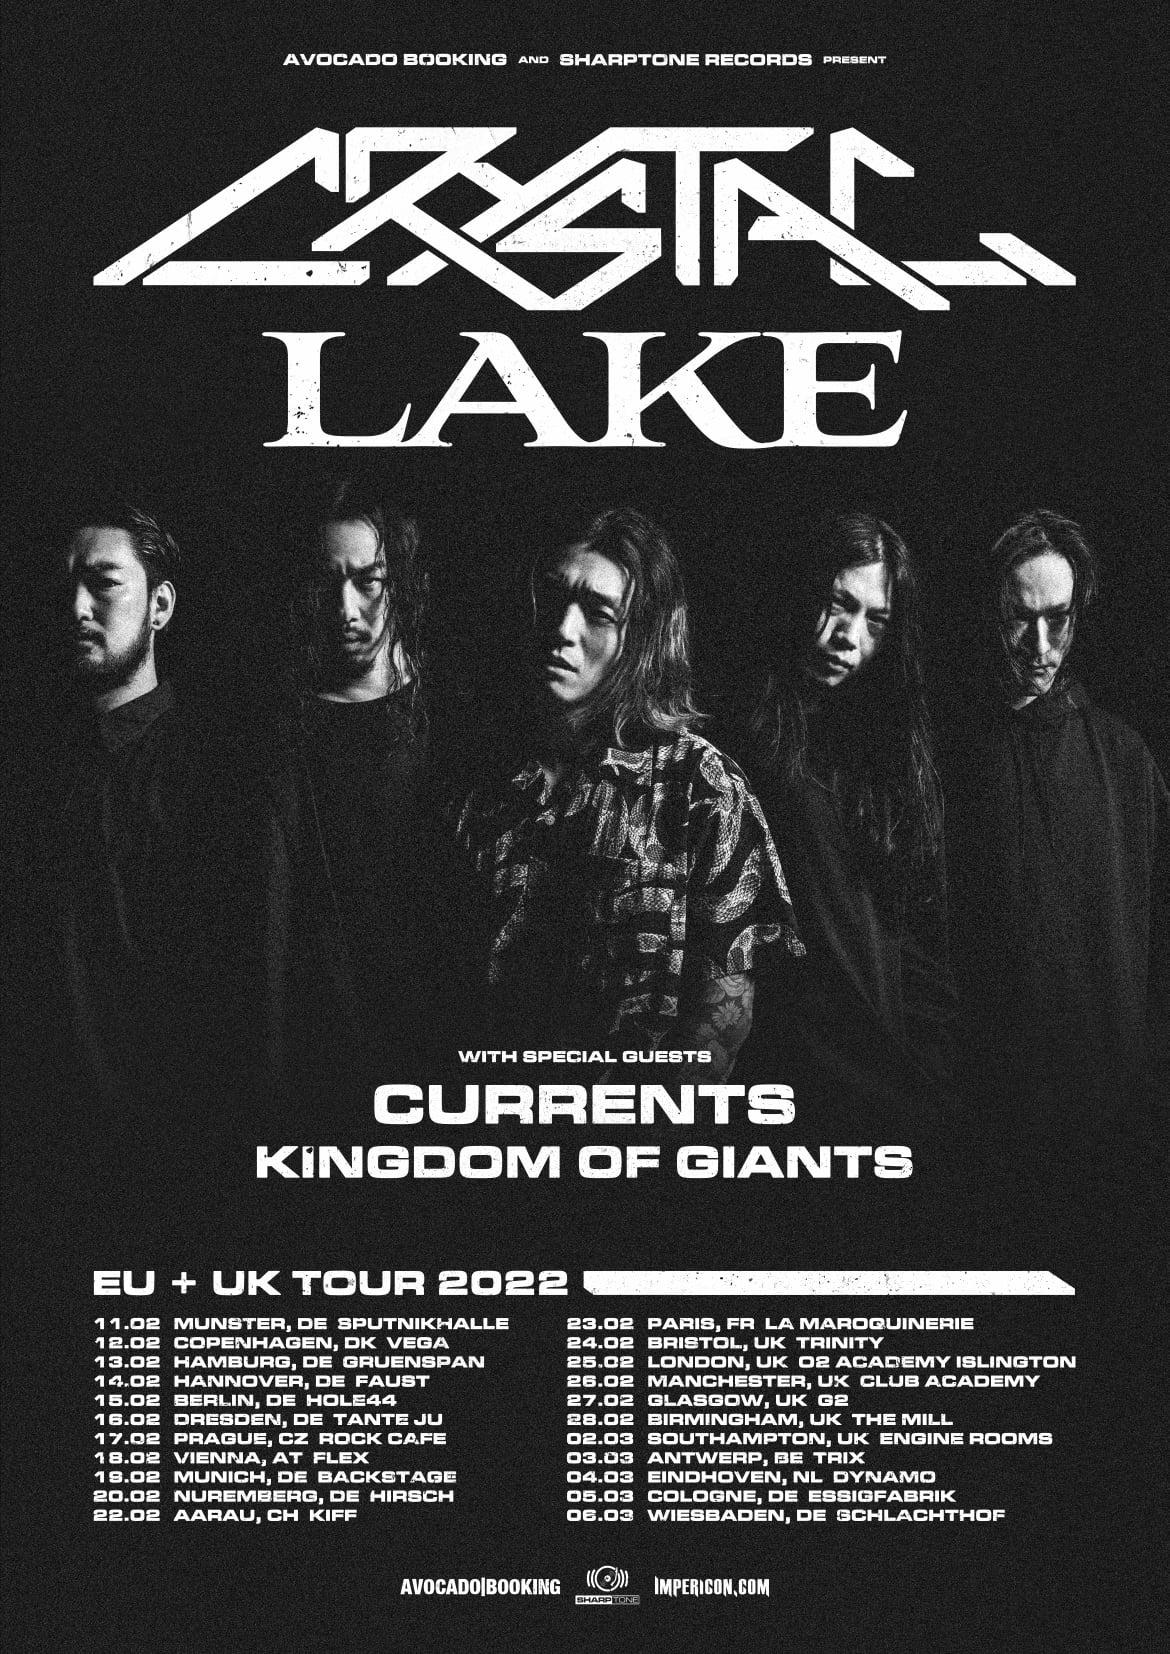 Crystal lake eu uk tour 2022